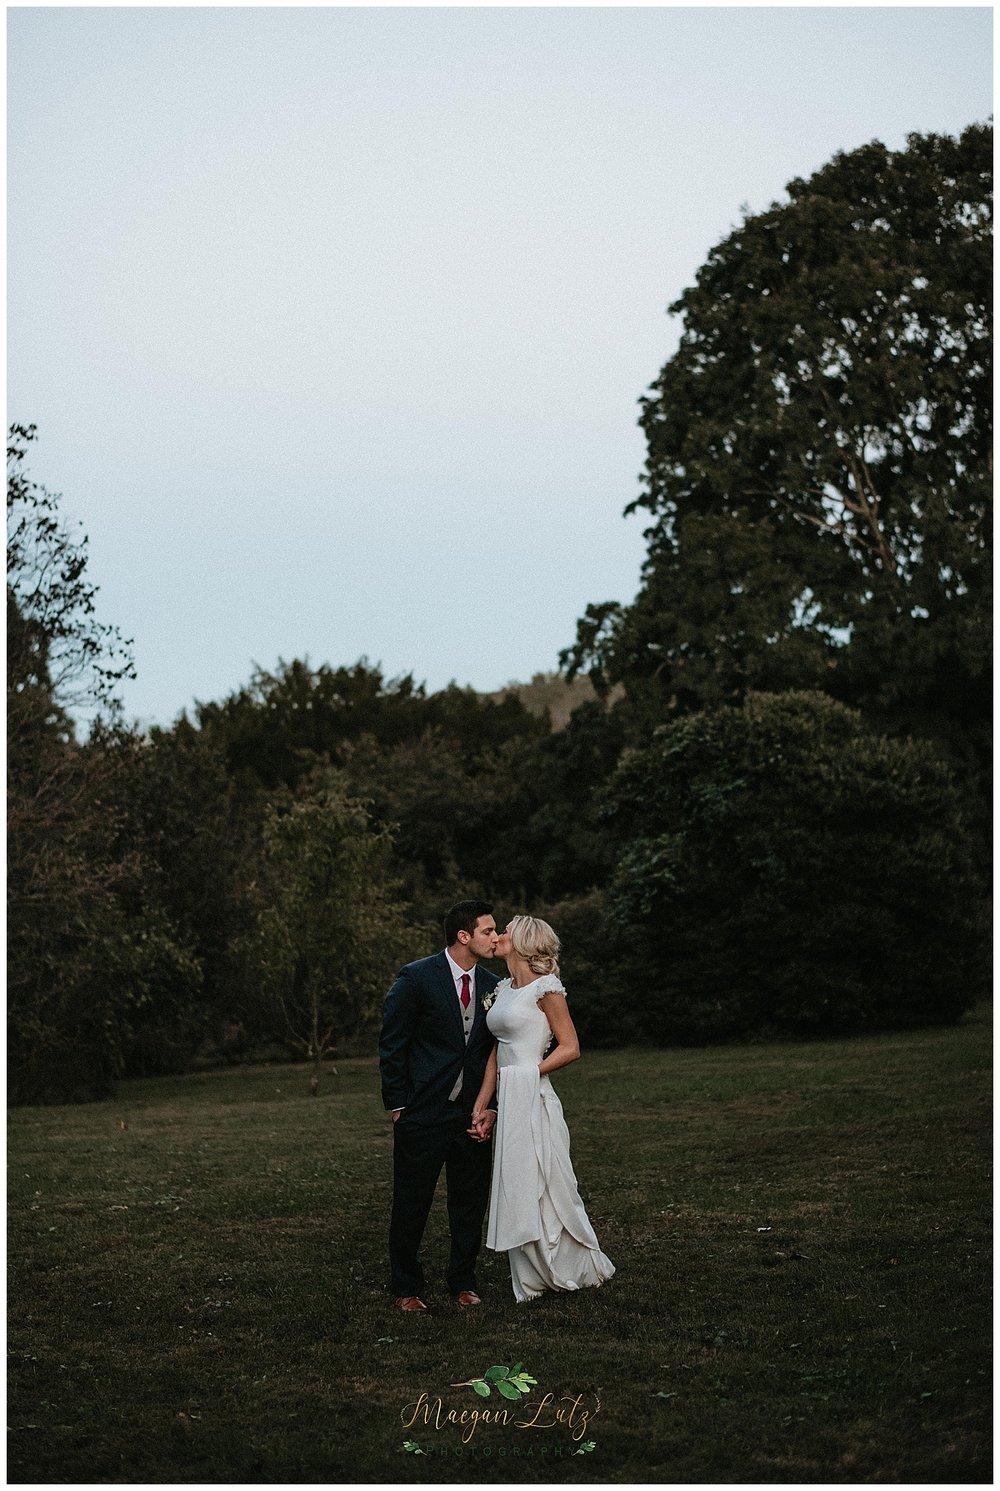 NEPA-wedding-photographer-at-Tyler-Arboretum-Media-PA_0038.jpg